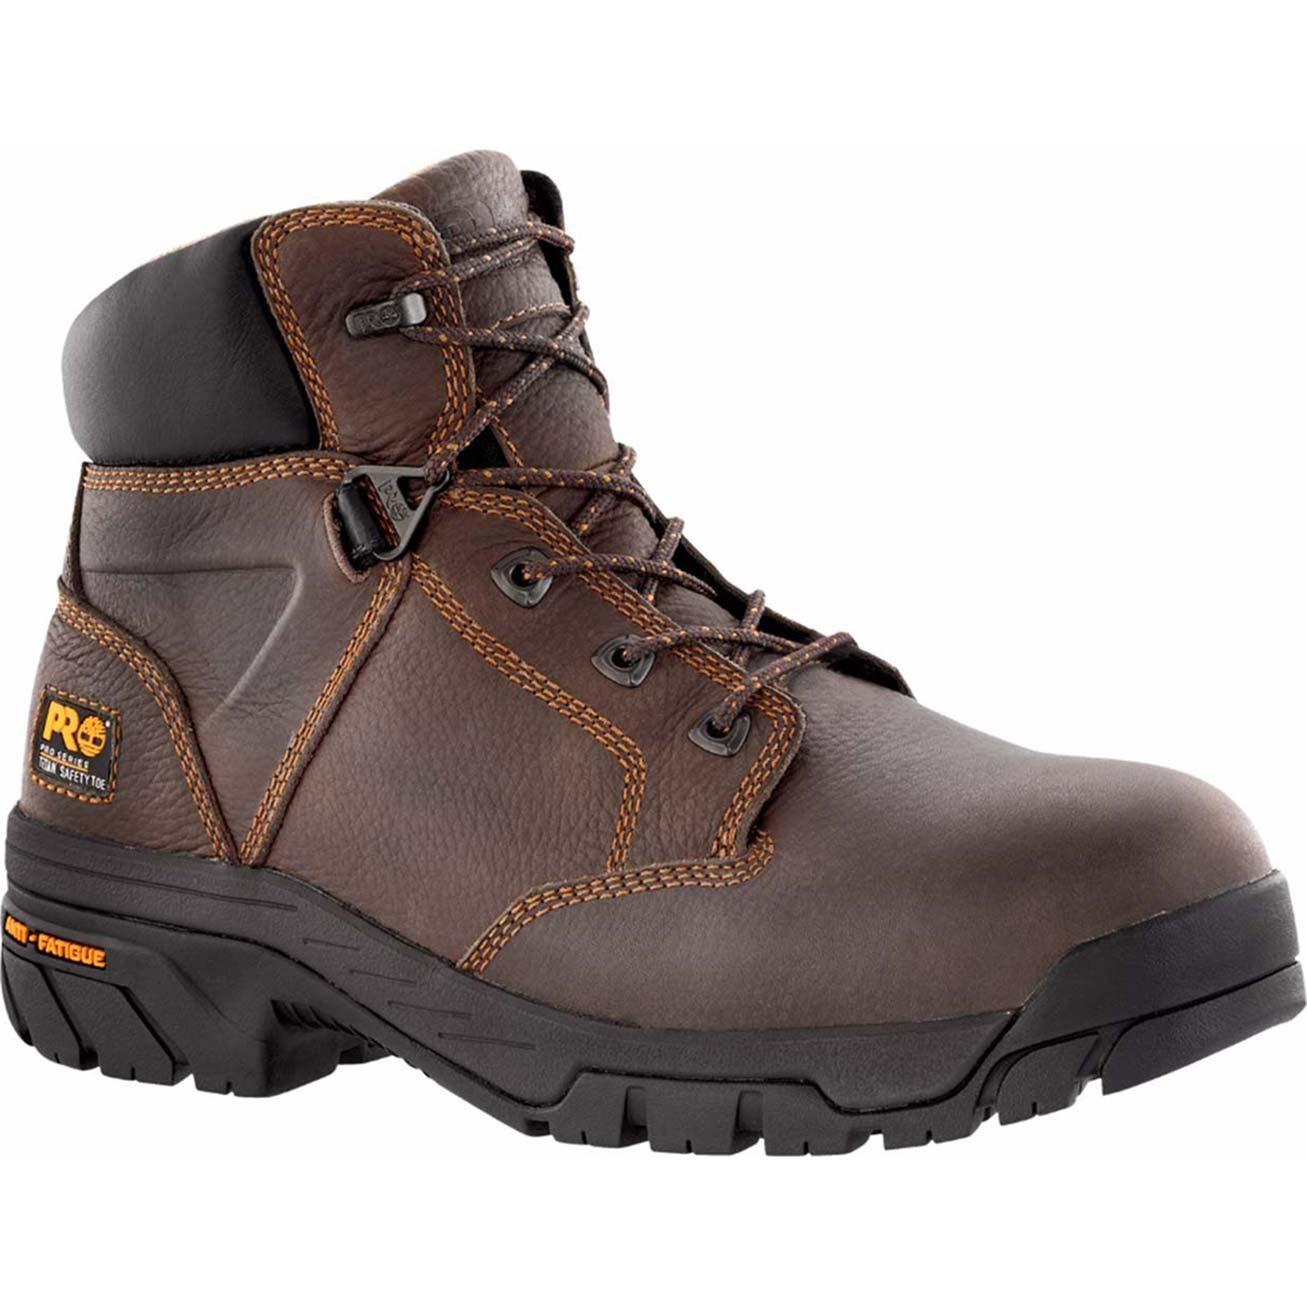 Timberland PRO® Helix Alloy Toe Waterproof Work Boot, , large